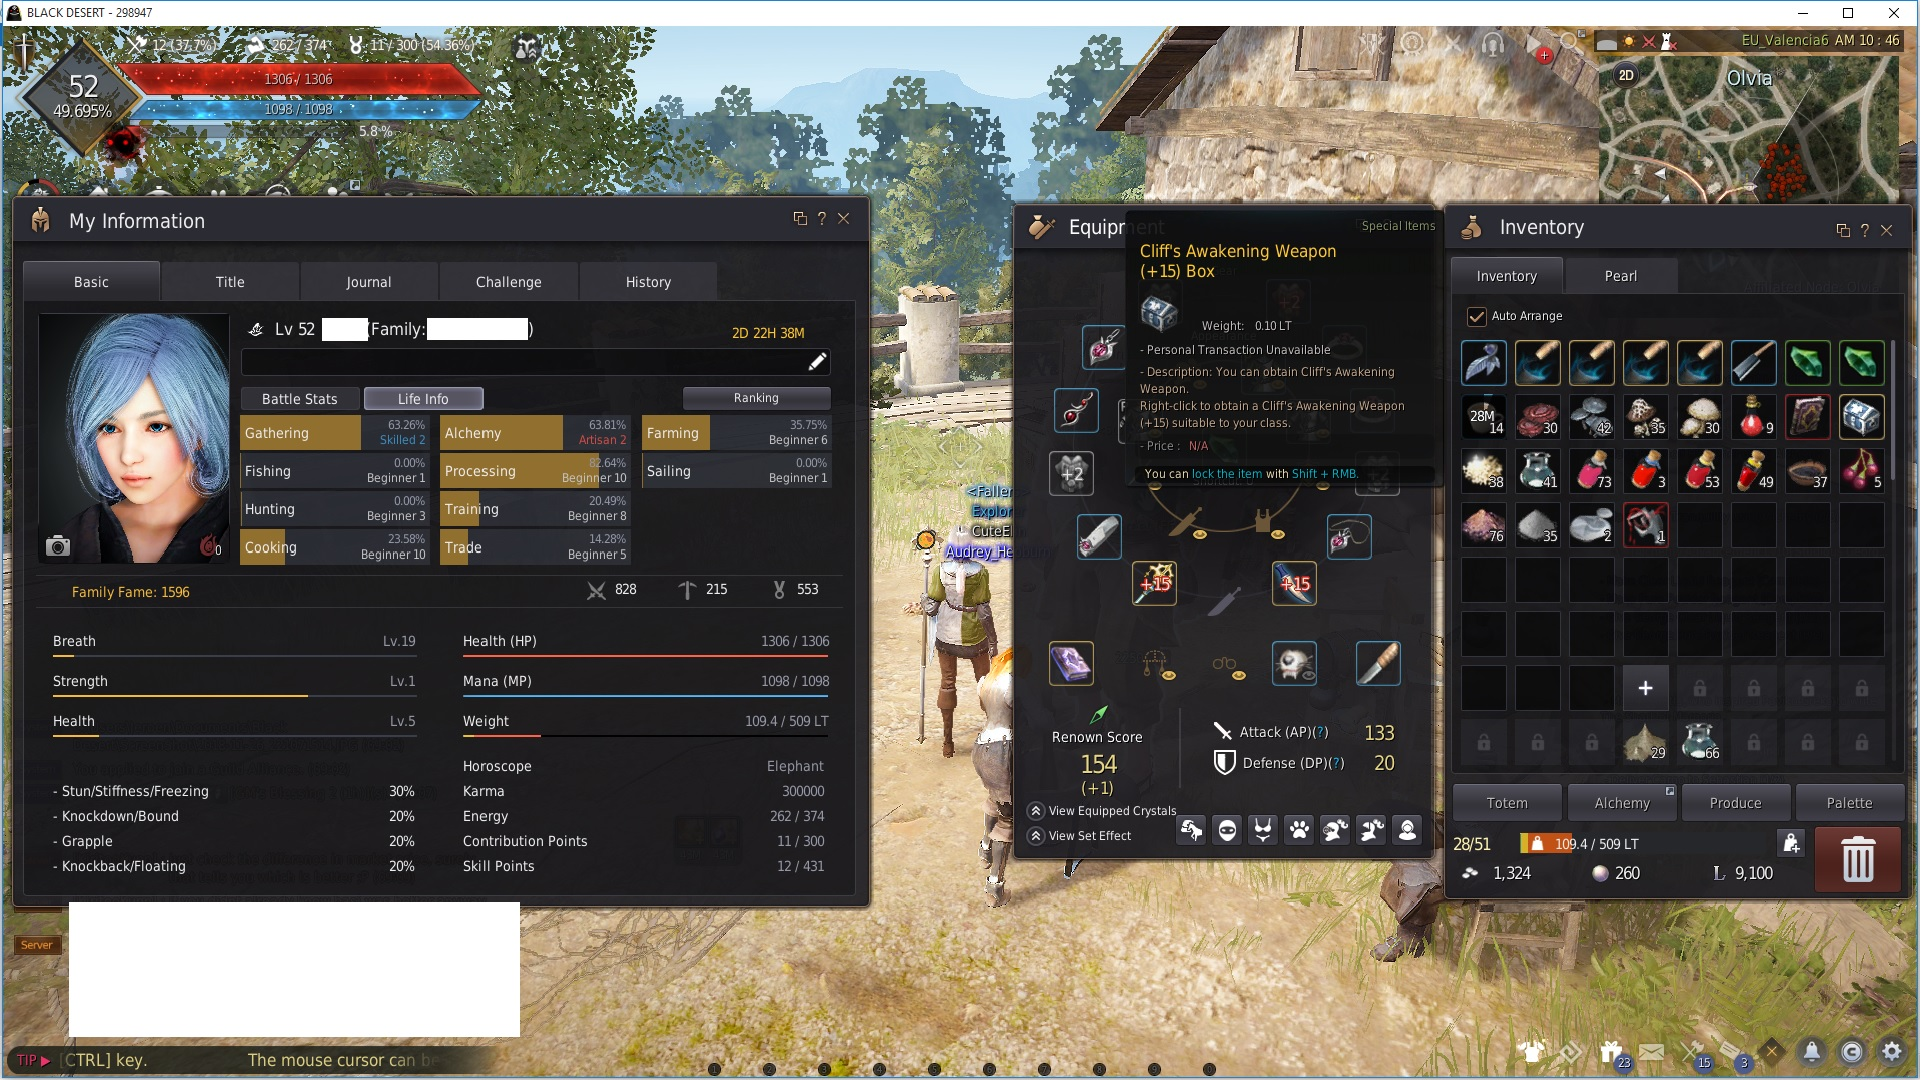 Selling] 61 Berserker 476 GS - full boss, tri Kzarka/dande